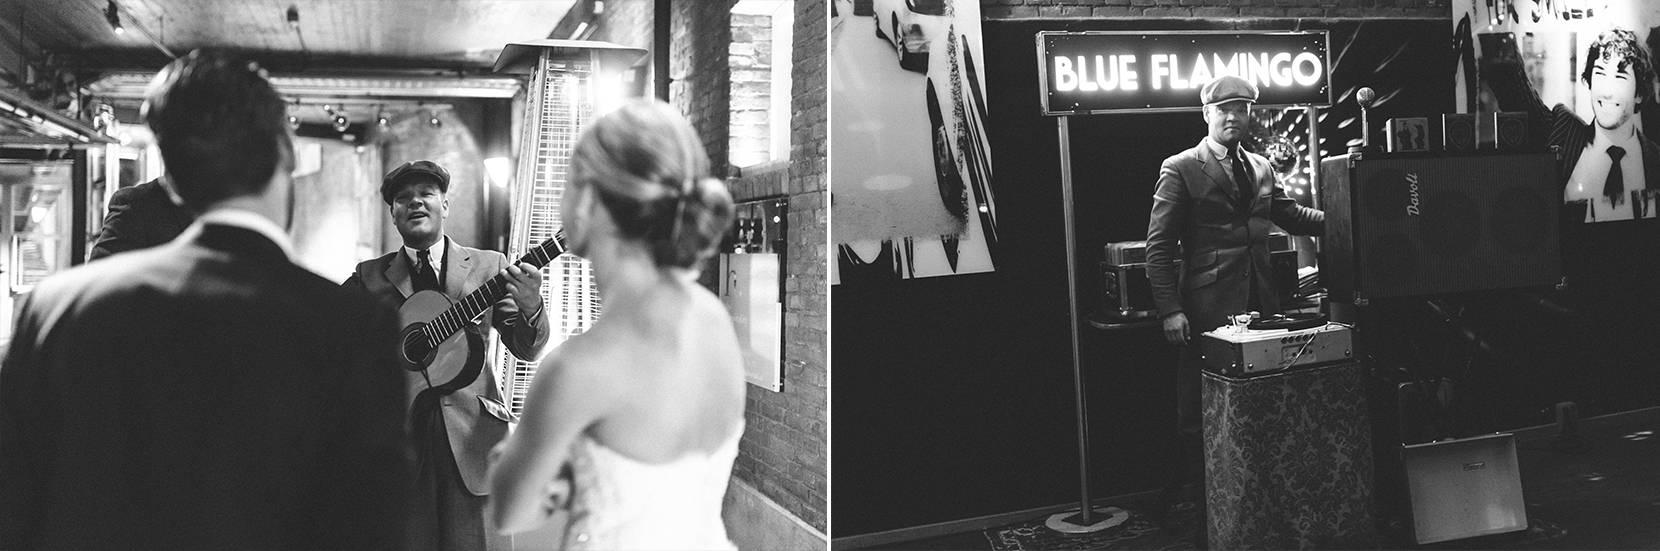 Bruidsfotografie_Rotterdam_Rogier_Martine-46